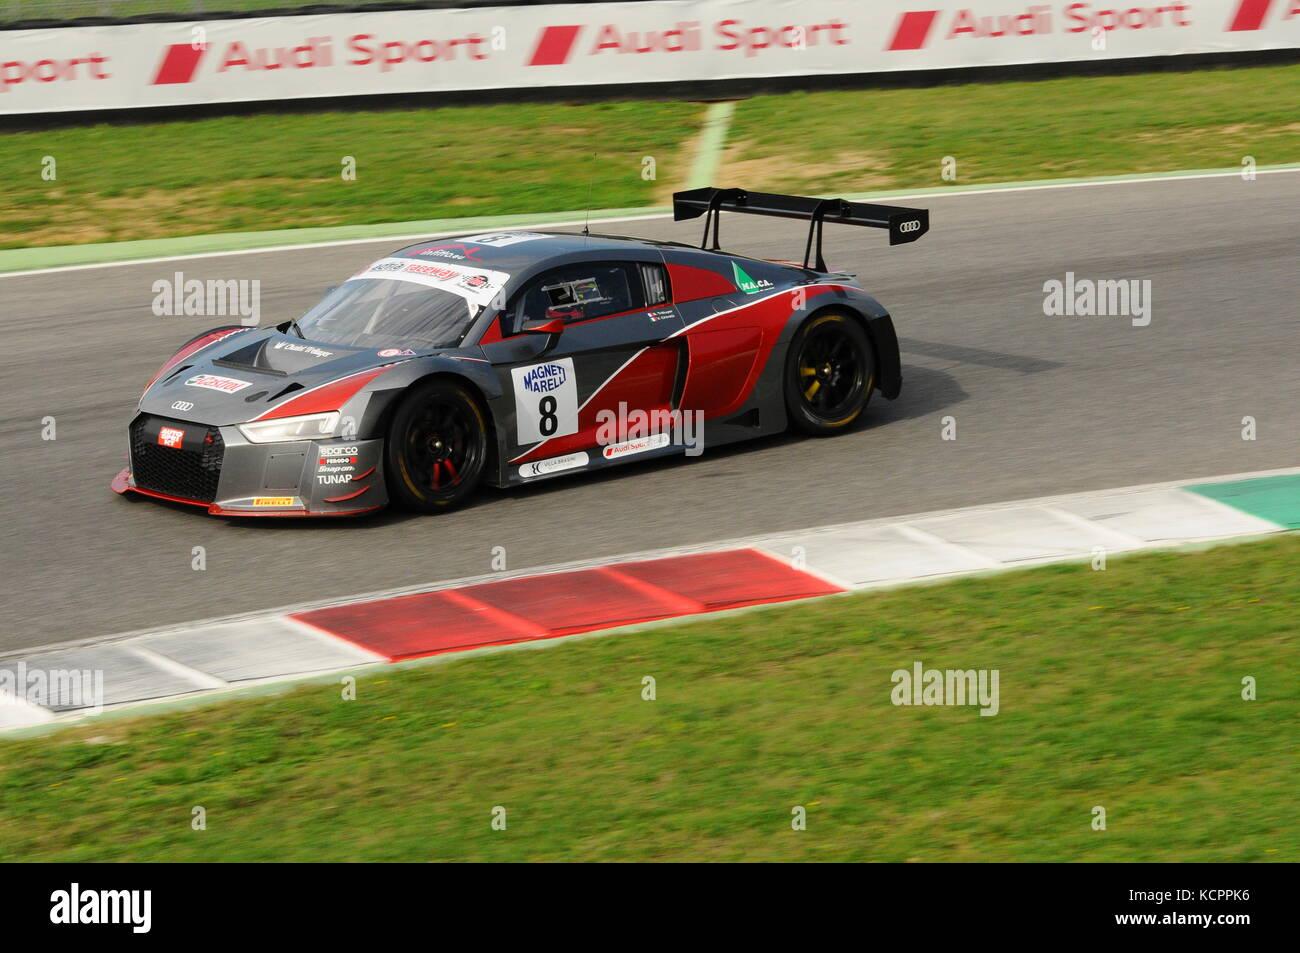 Mugello Circuit, Italy. 6th Oct, 2017. AUDI R8 LMS AUDI SPORT Italia Team driven by GHIRELLI Vittorio - TRELUYER Stock Photo